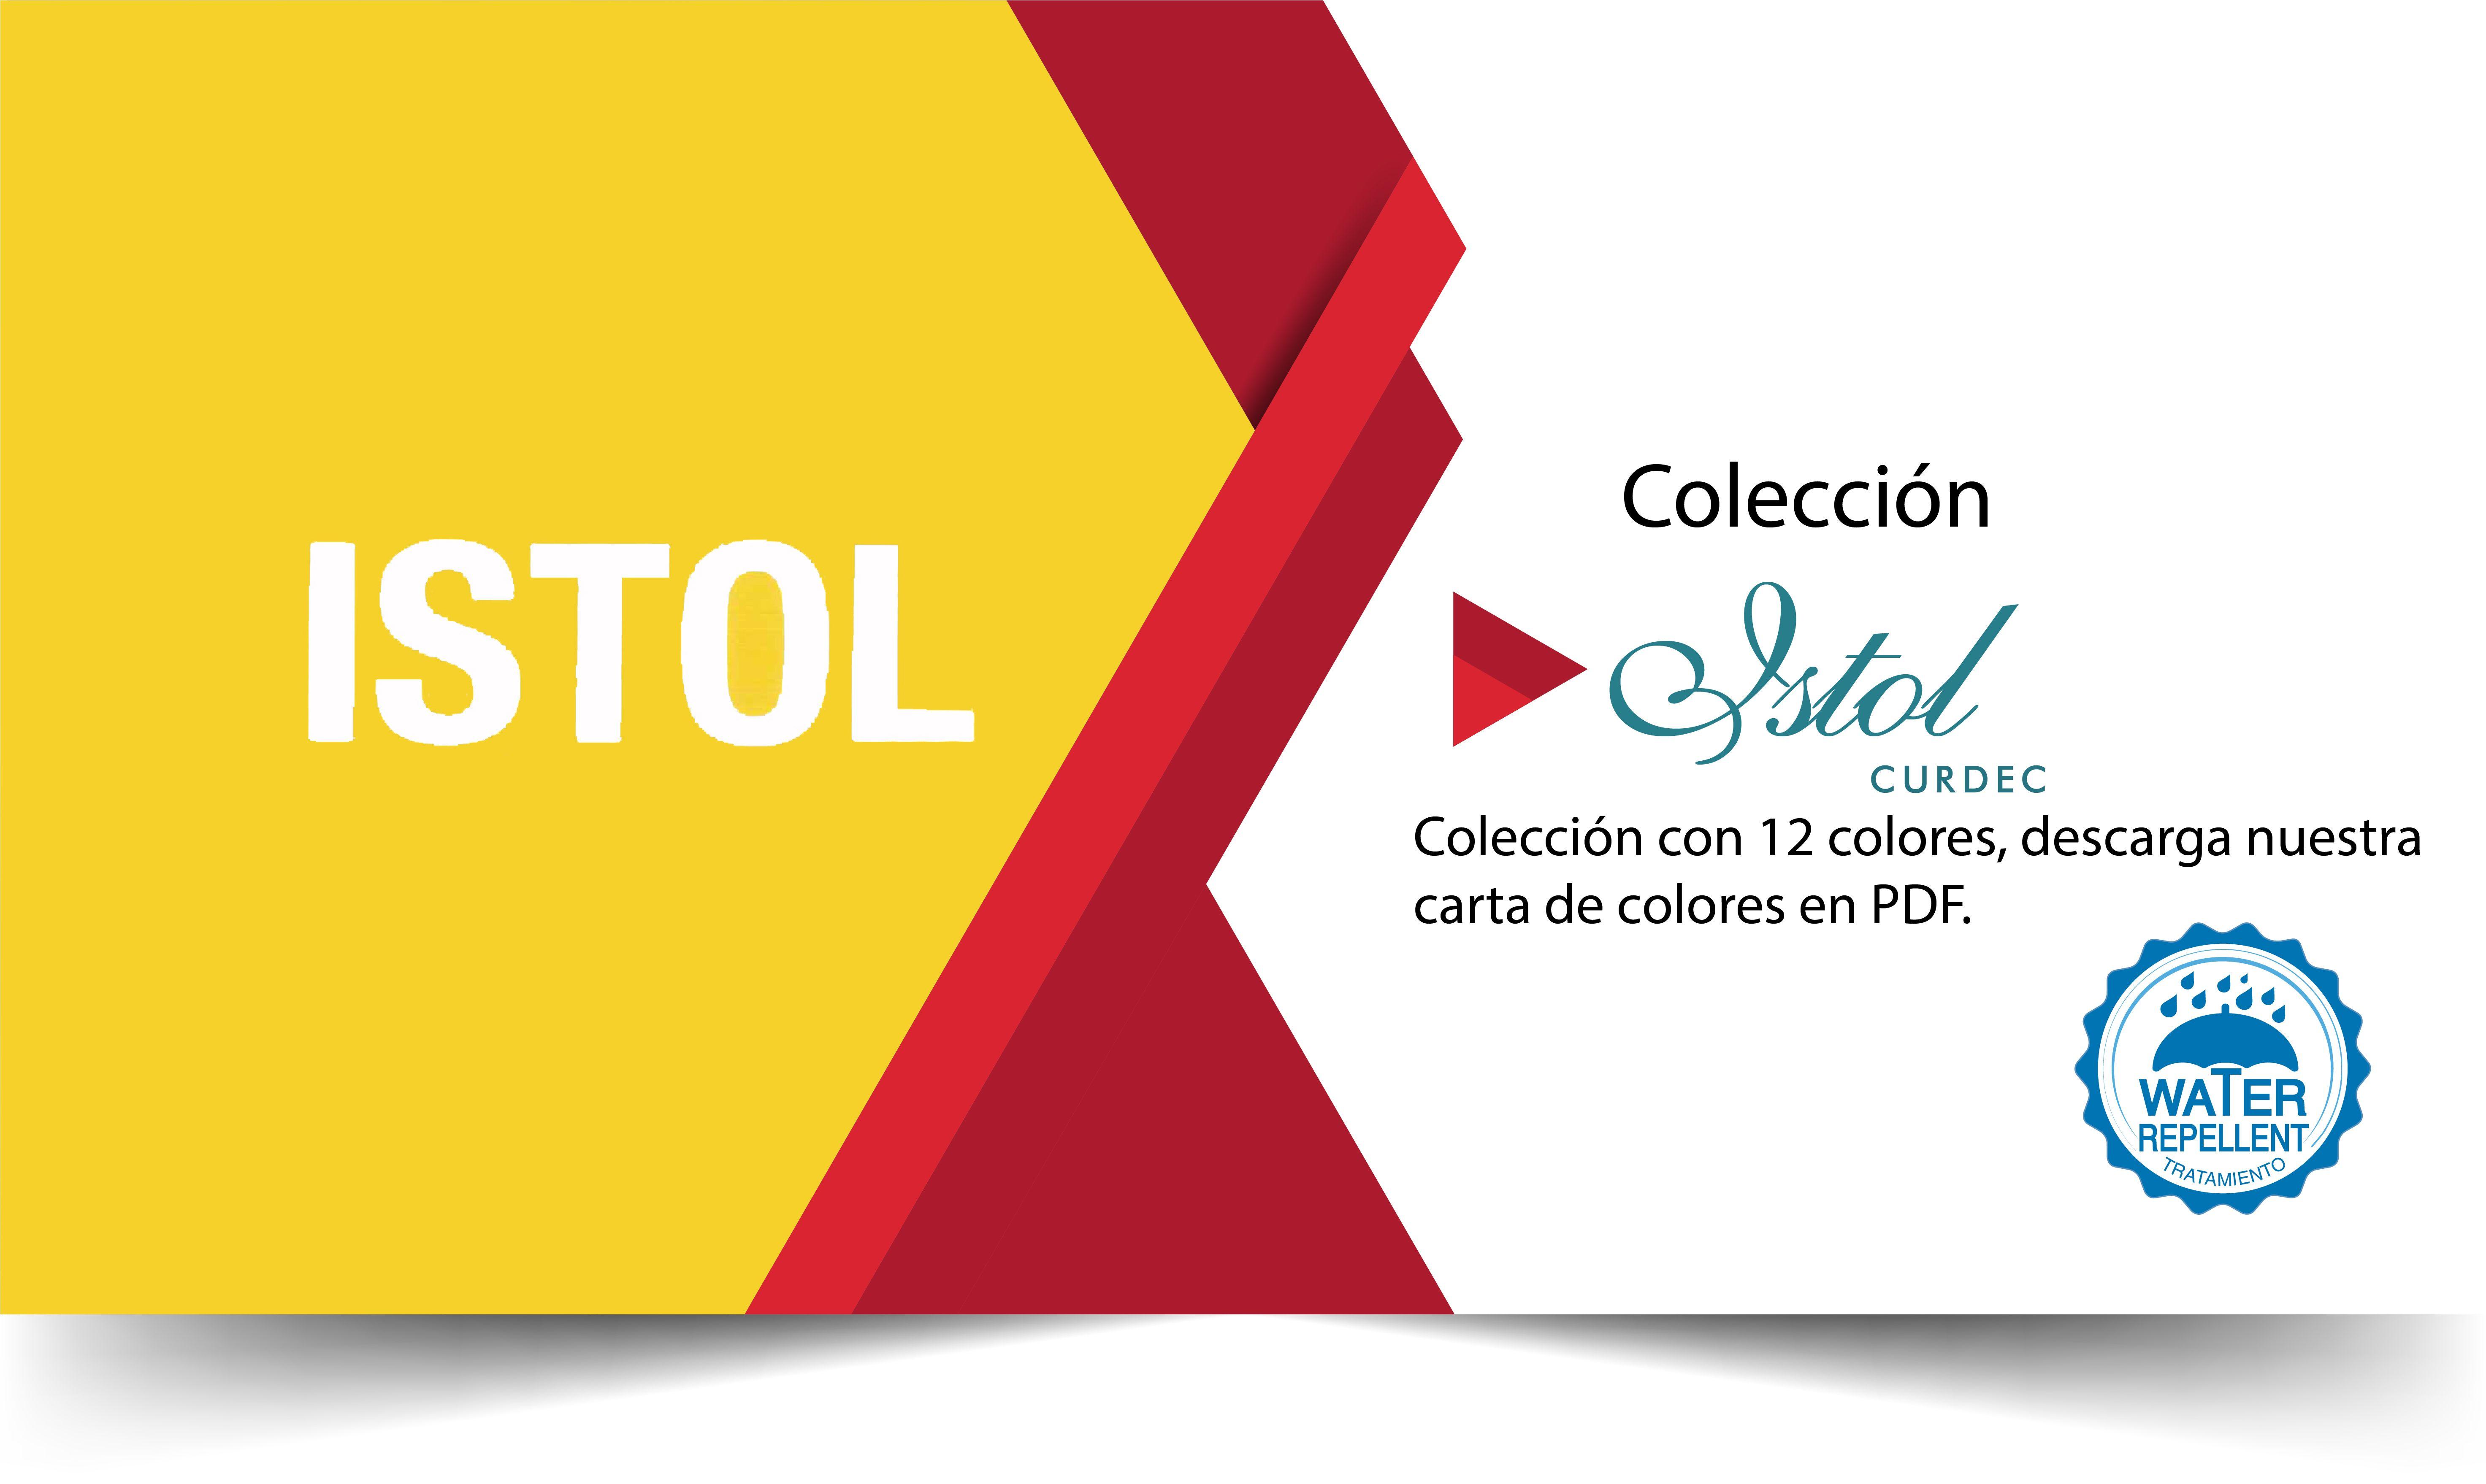 Catalogo Istol